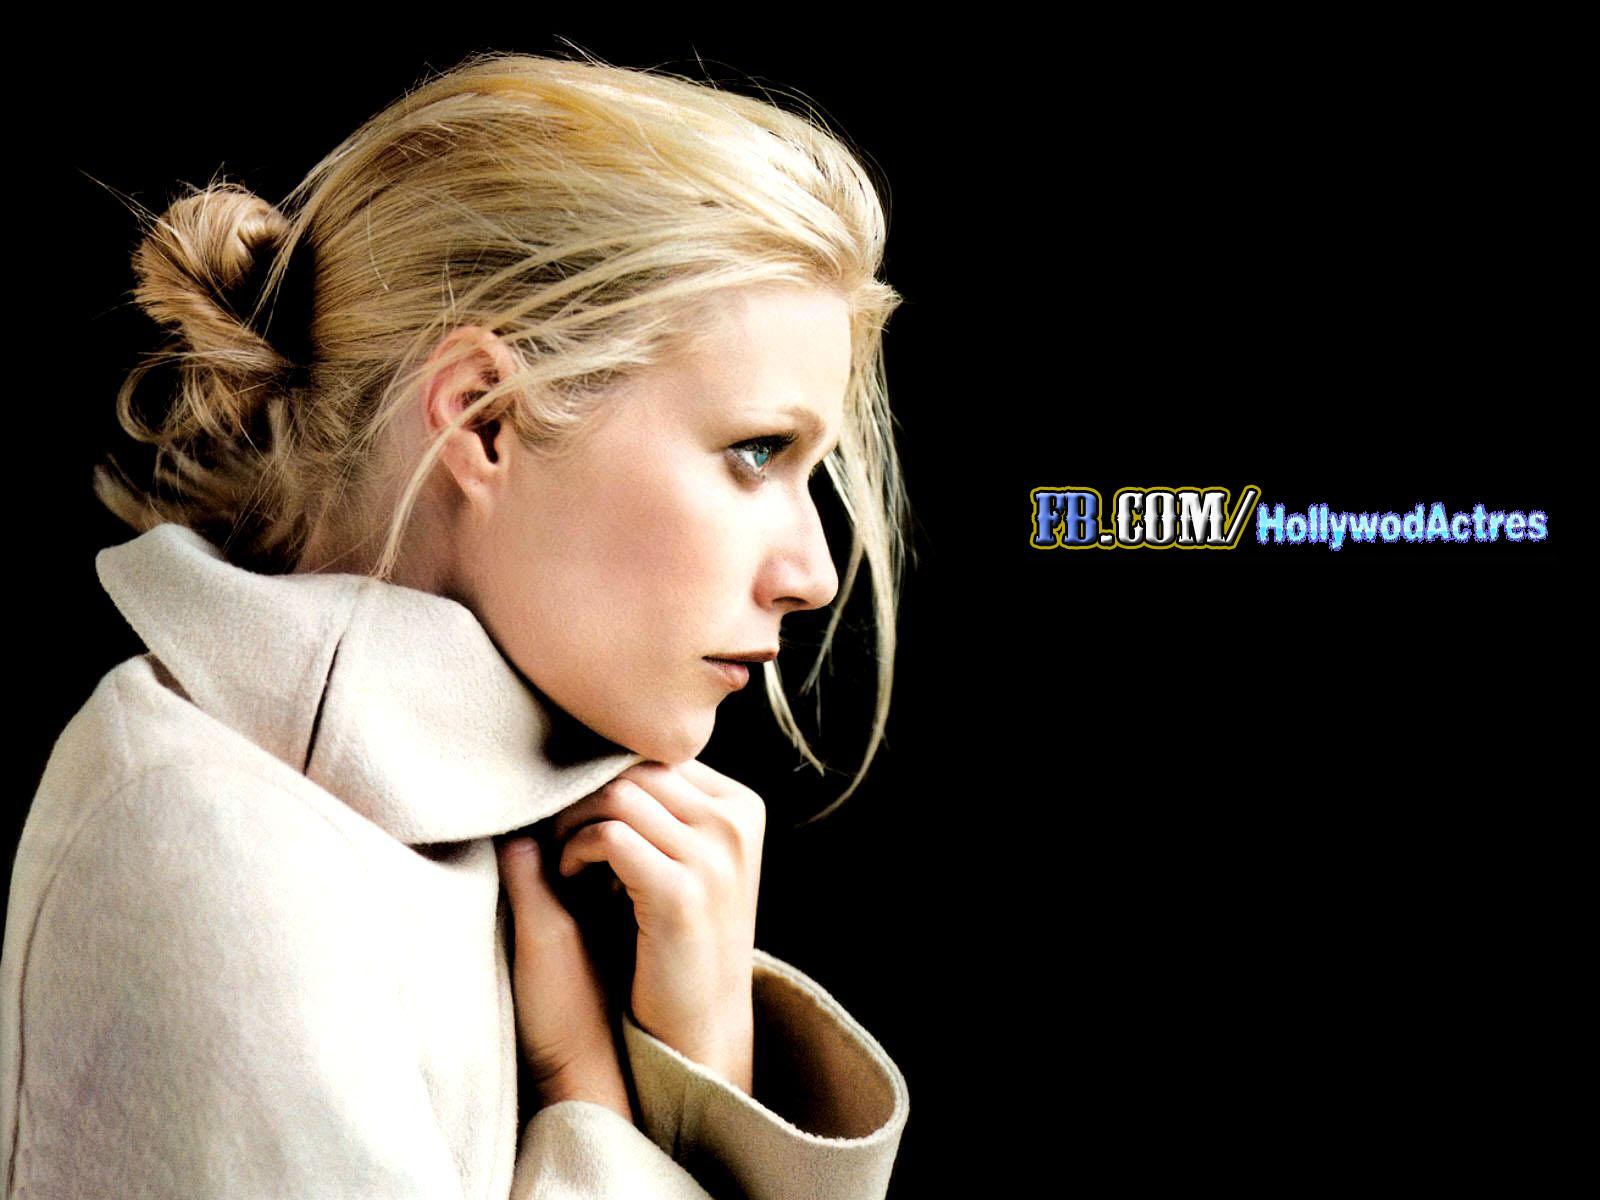 http://3.bp.blogspot.com/-kqmzUm2Lt_k/URQBtmlAEkI/AAAAAAAALJs/N7xoBh3x5Uk/s1600/Gwyneth+Paltrow+4.jpg